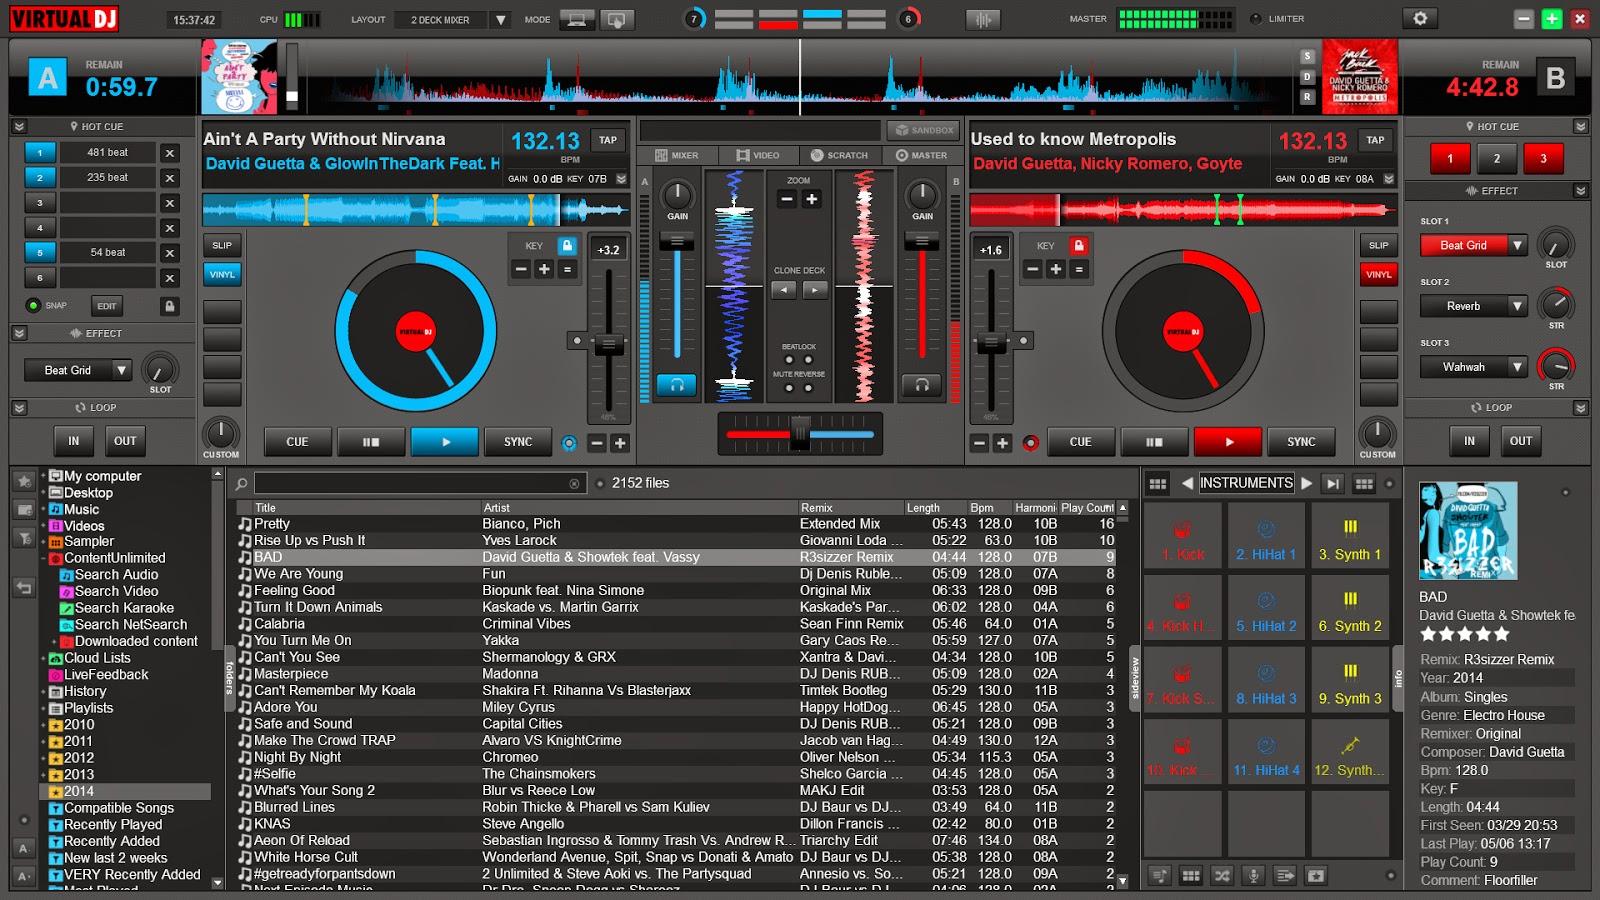 Virtual dj 70 full version download